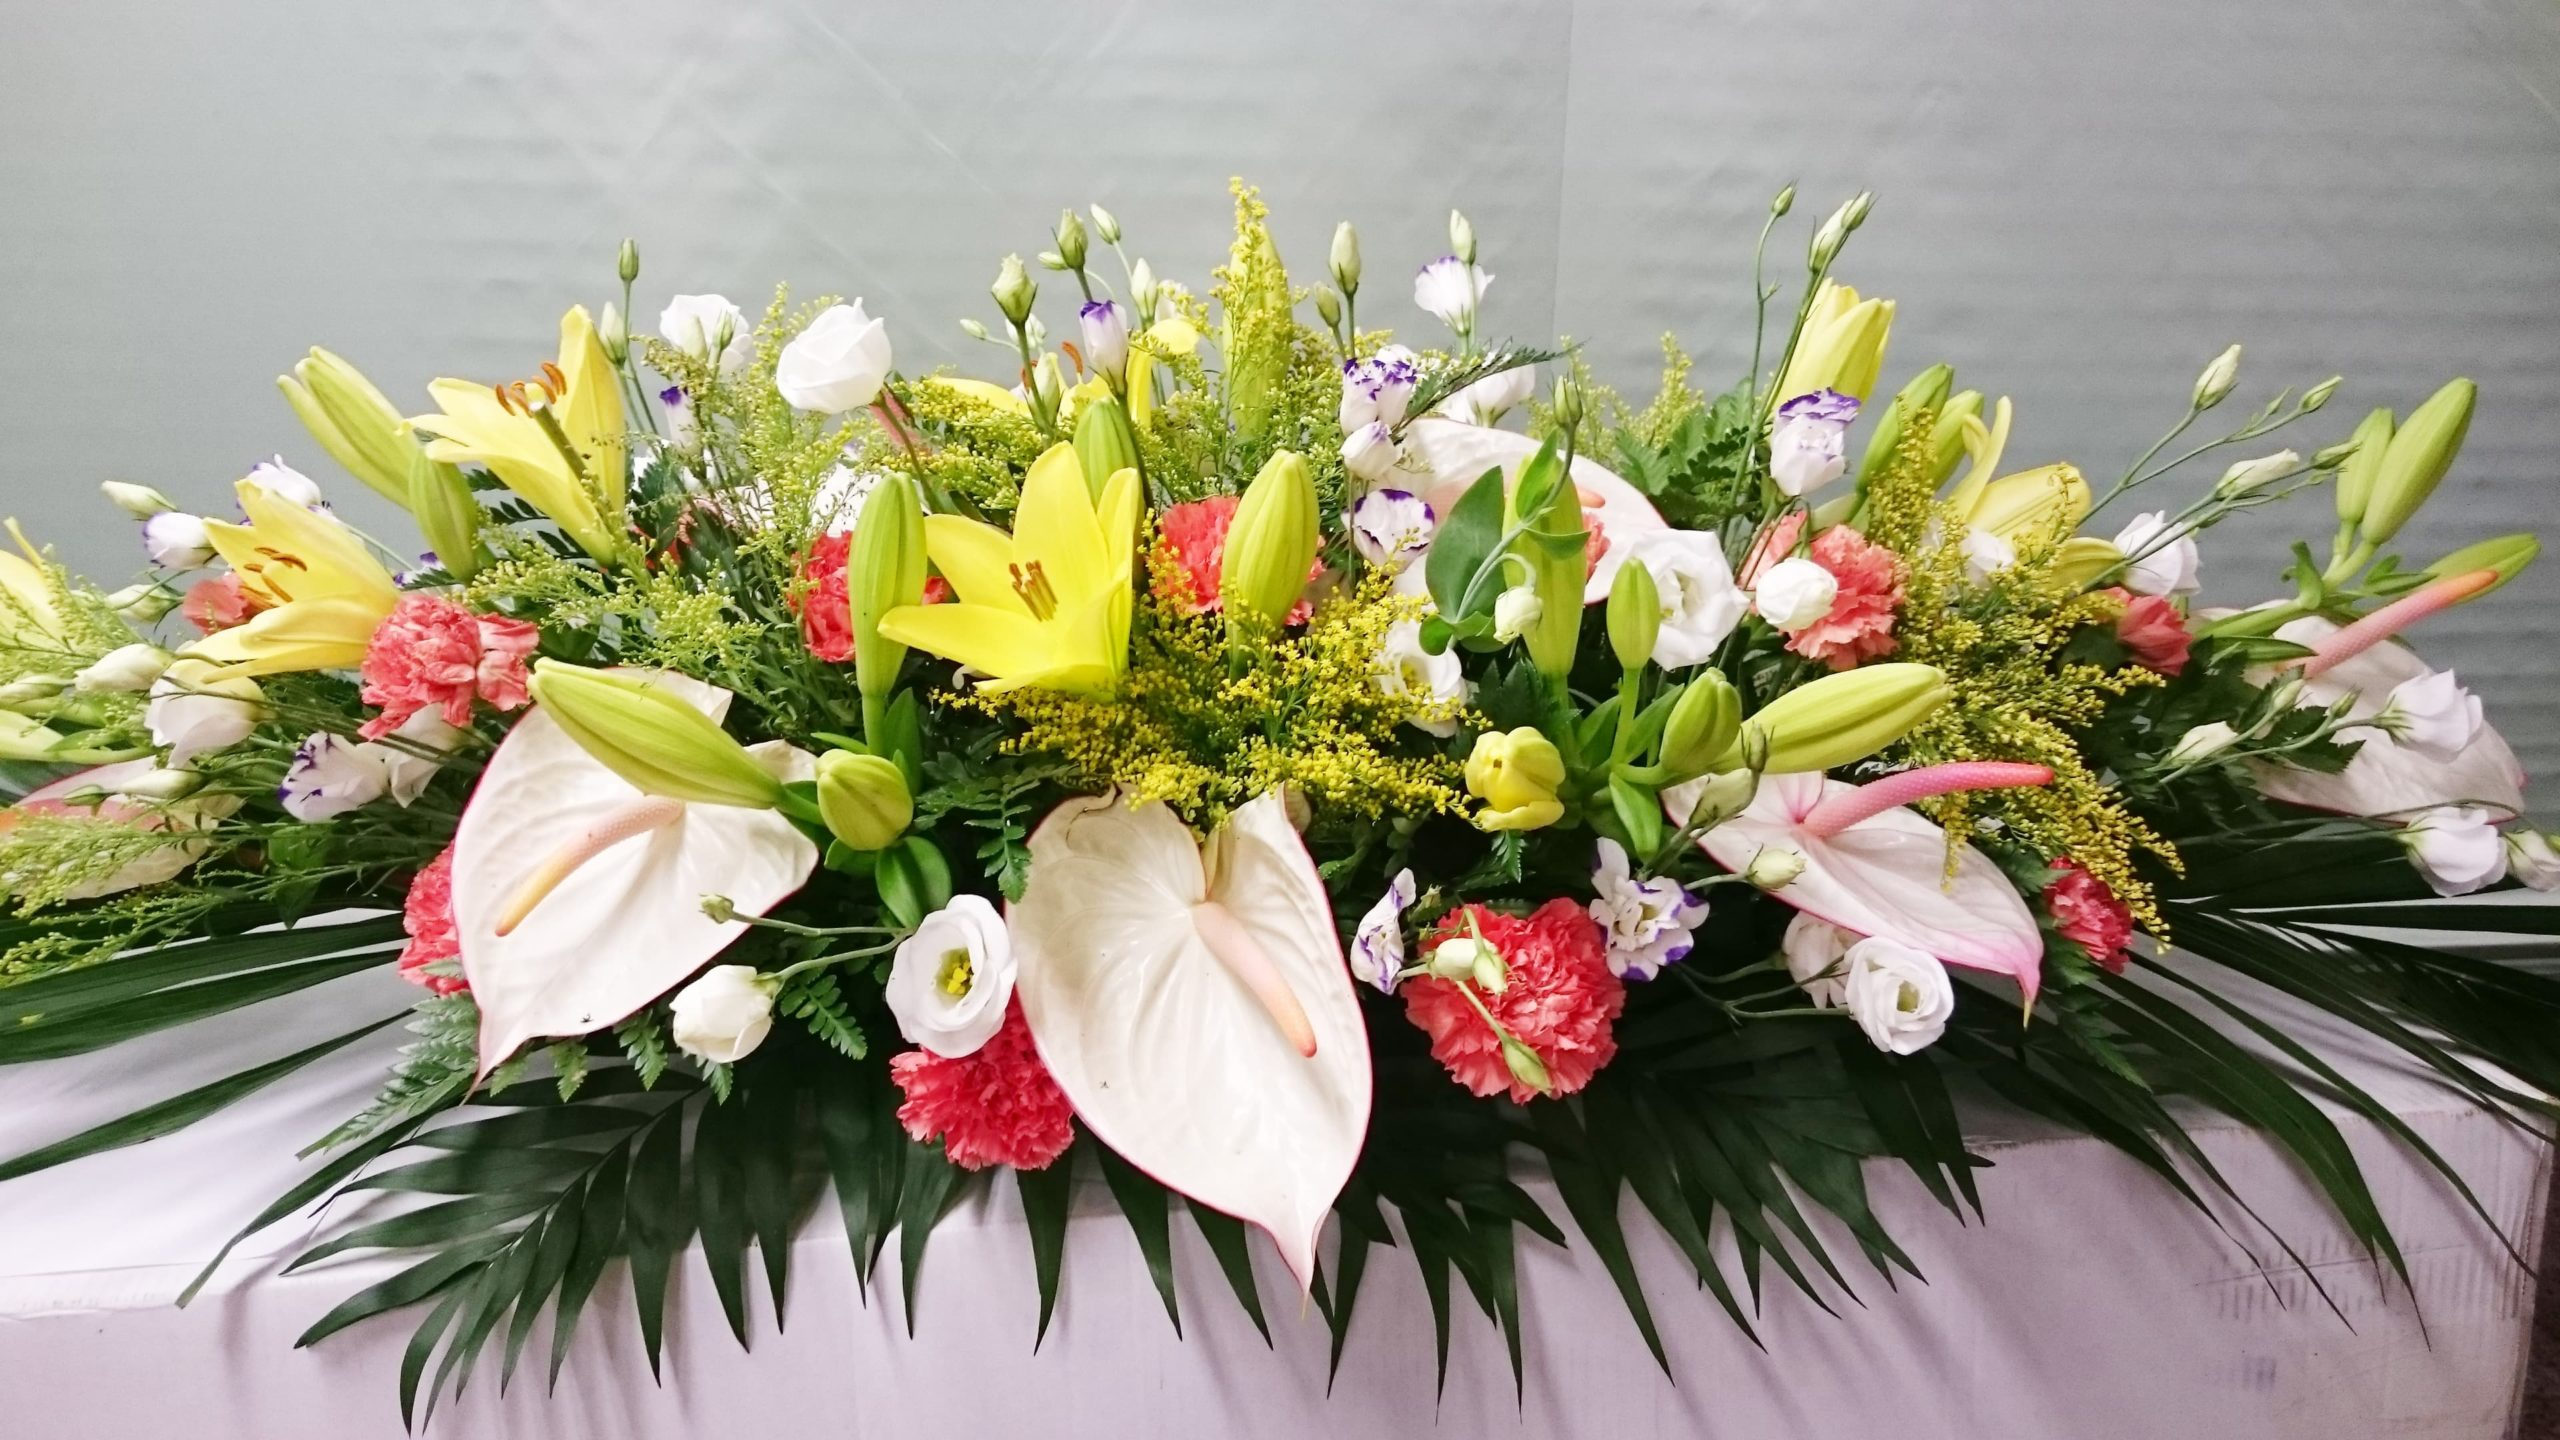 Arreglo floral Centro dos Esponjas